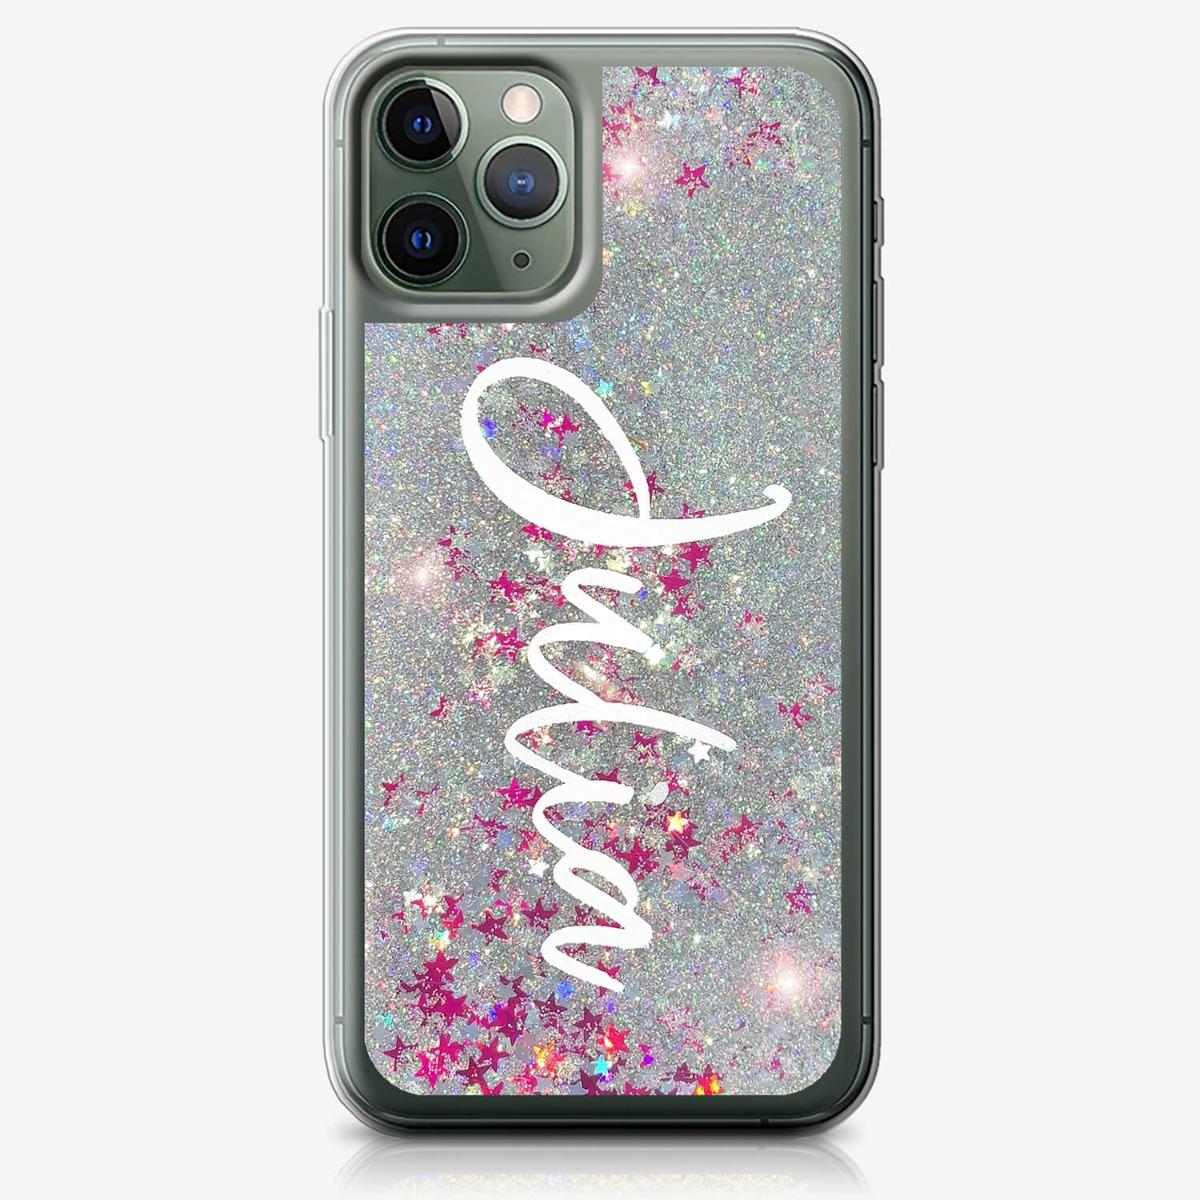 iPhone 11 Pro Max Glitter Case 16131